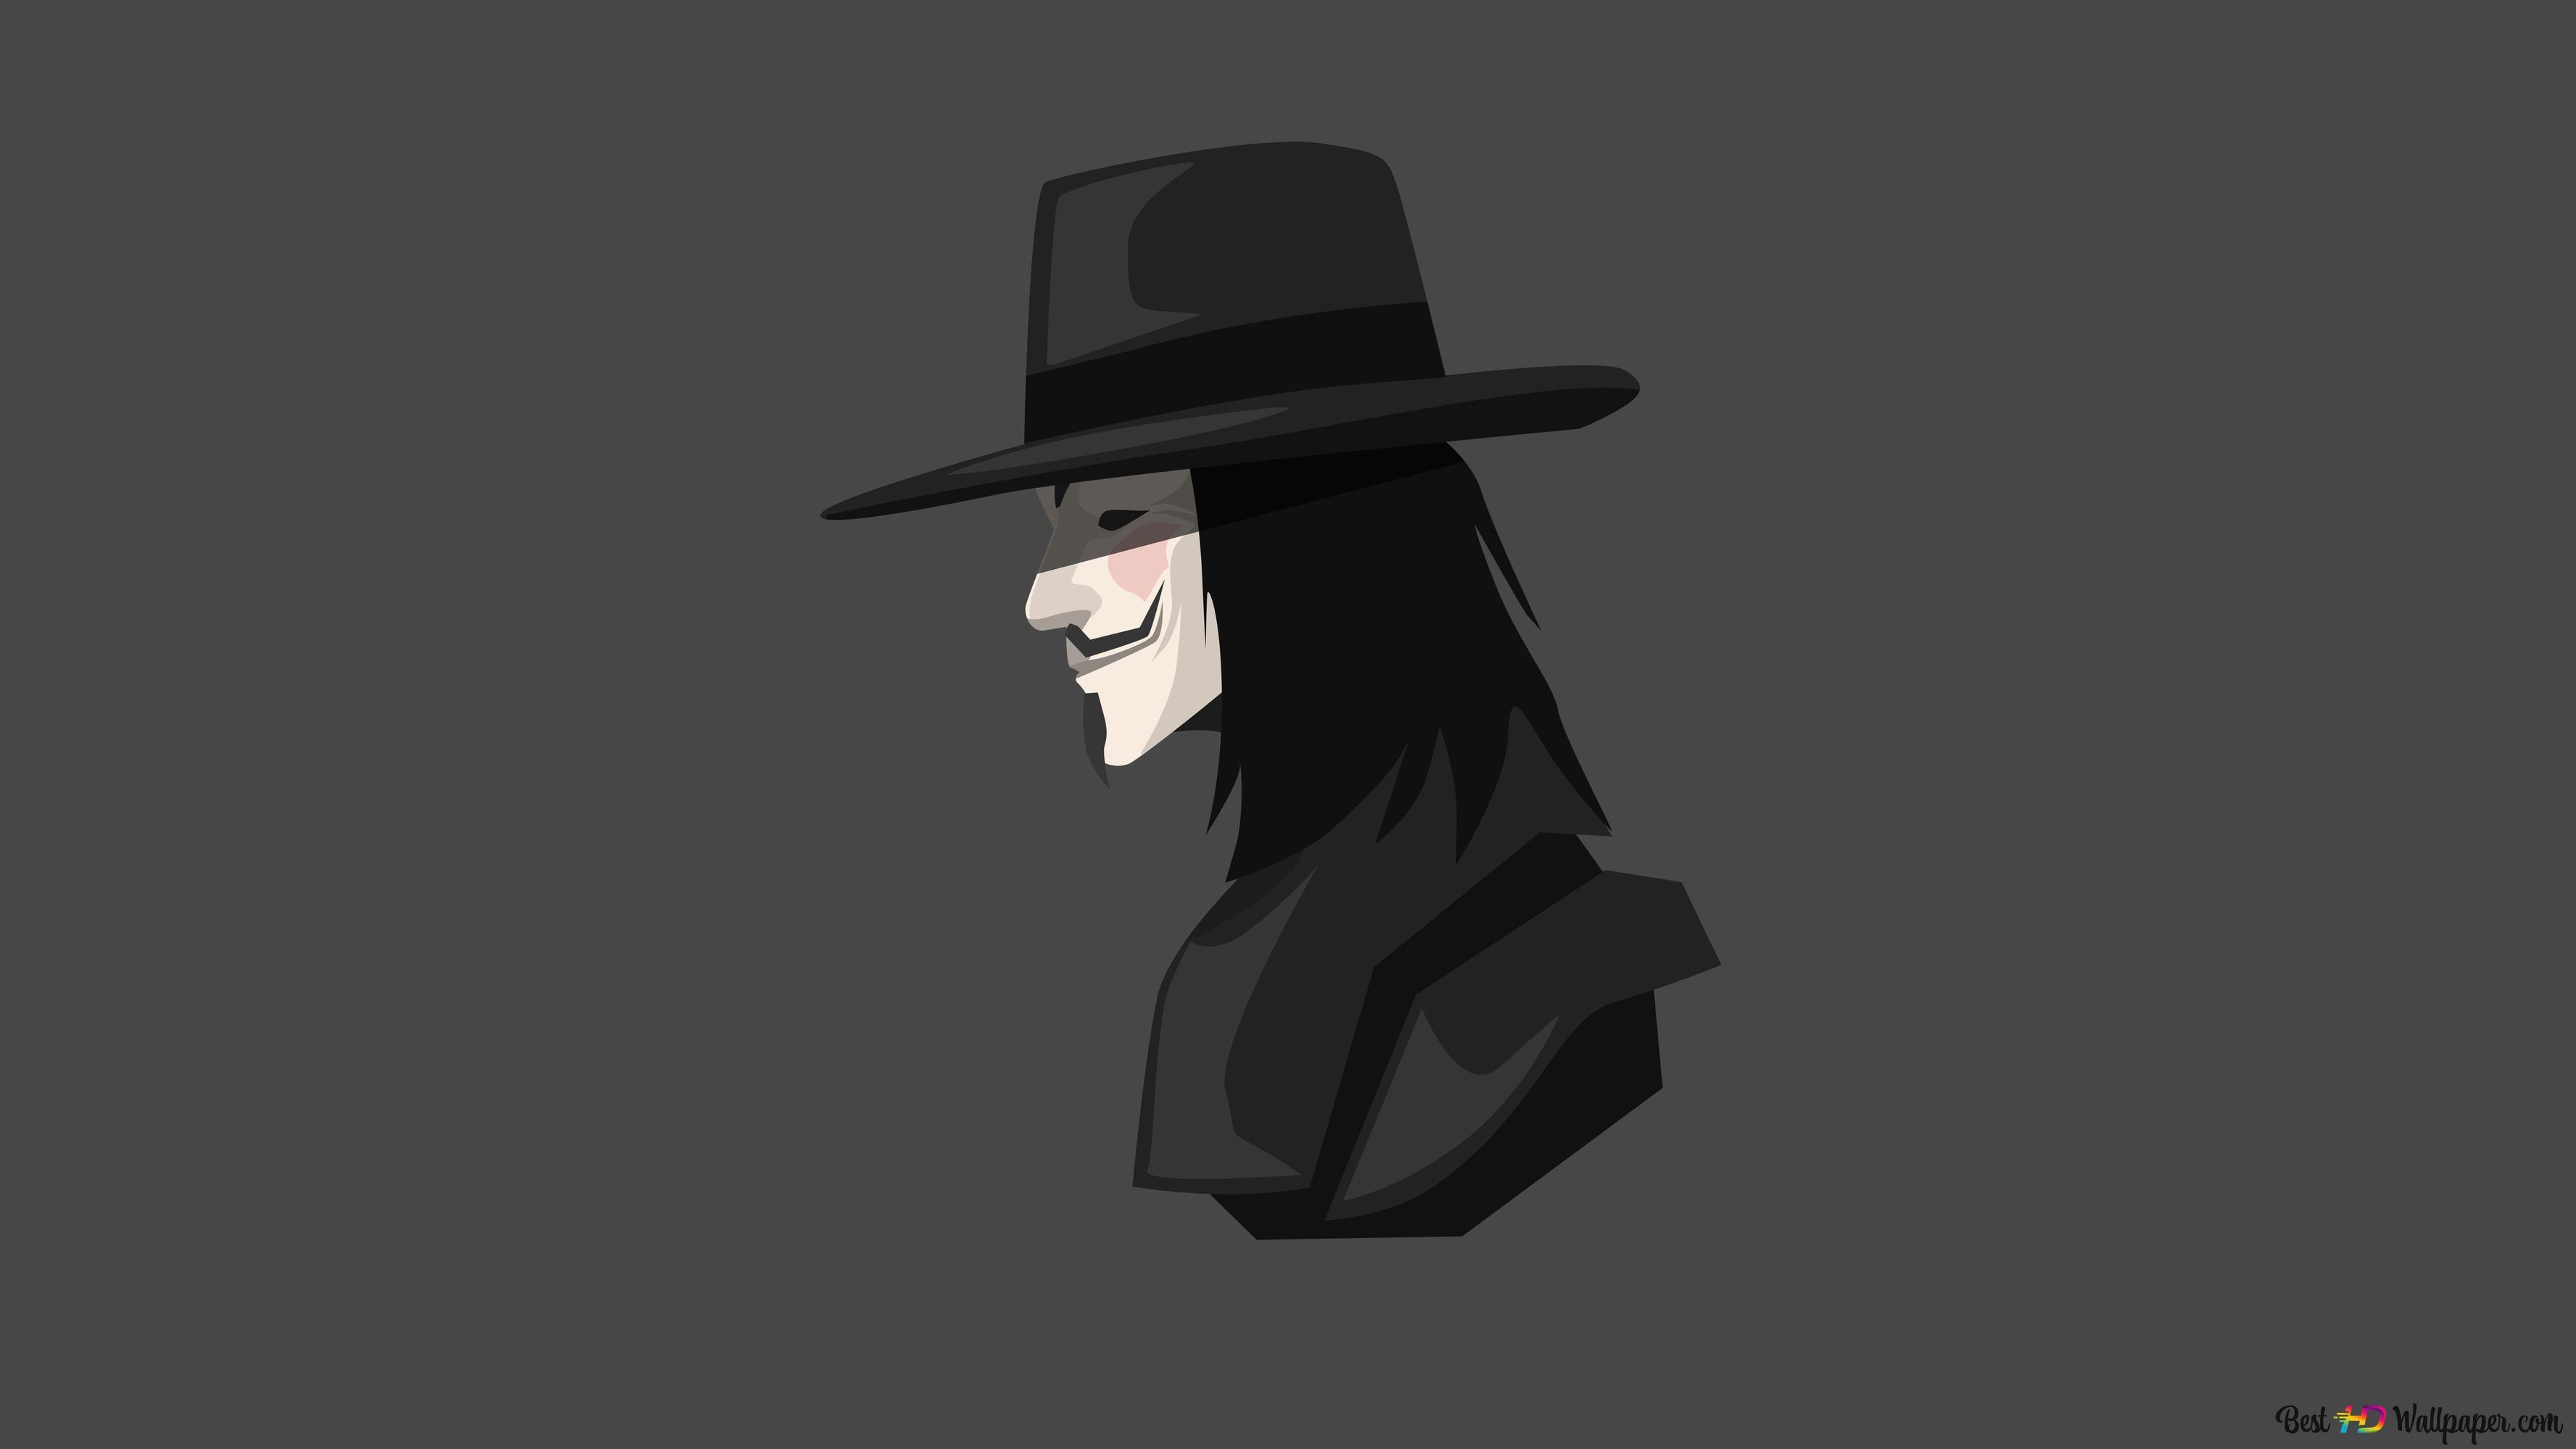 V For Vendetta Hd Wallpaper Download